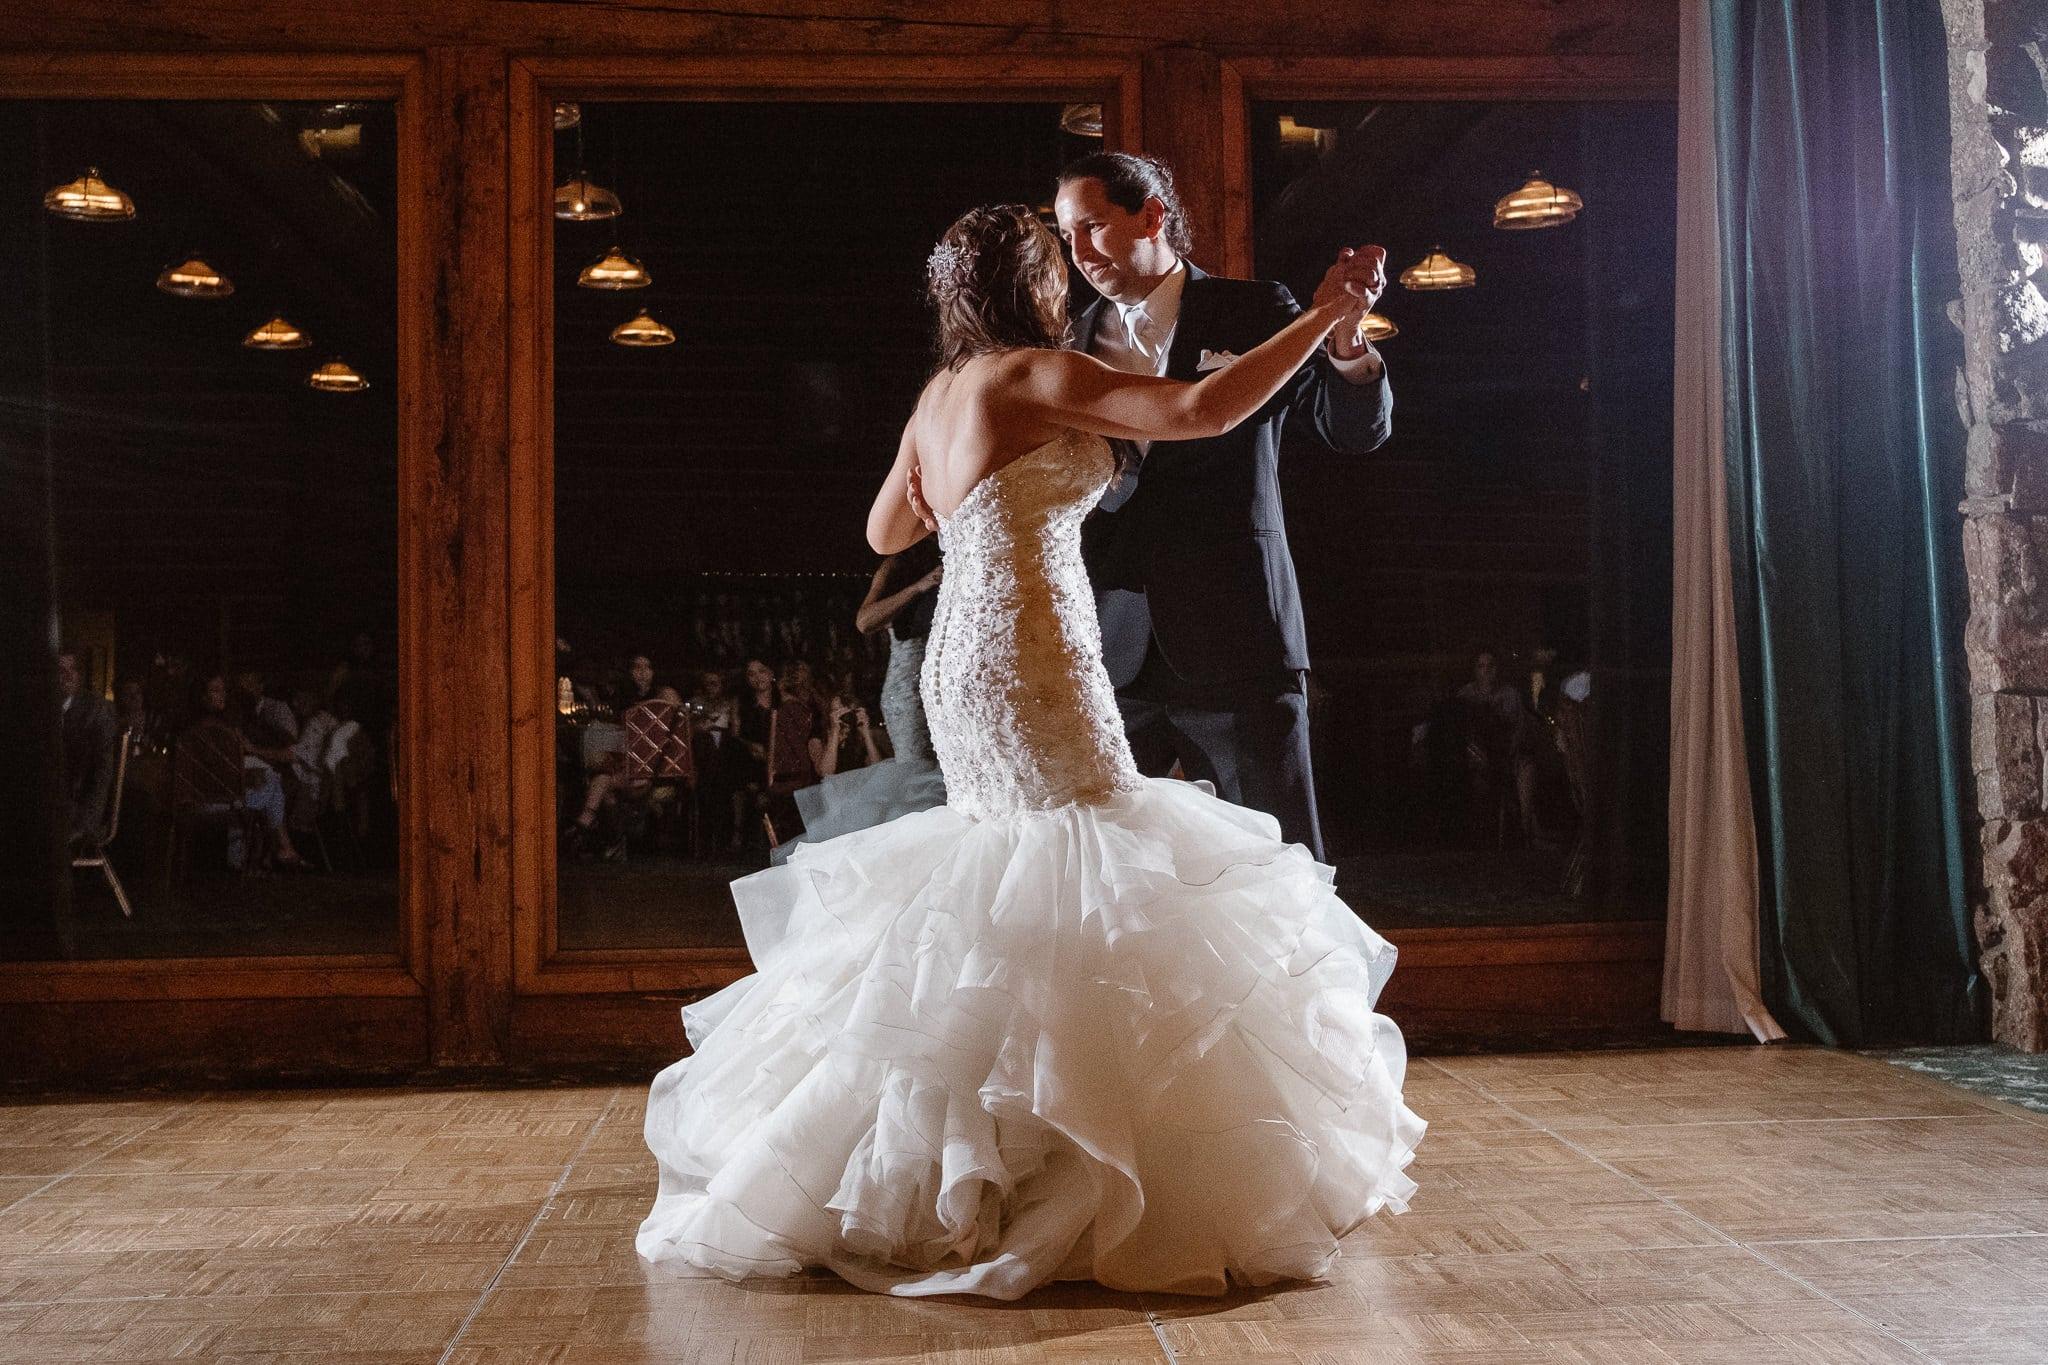 Dao House wedding photographer, Estes Park wedding venue, Colorado mountain wedding, bride and groom first dance, wedding dance, dancing